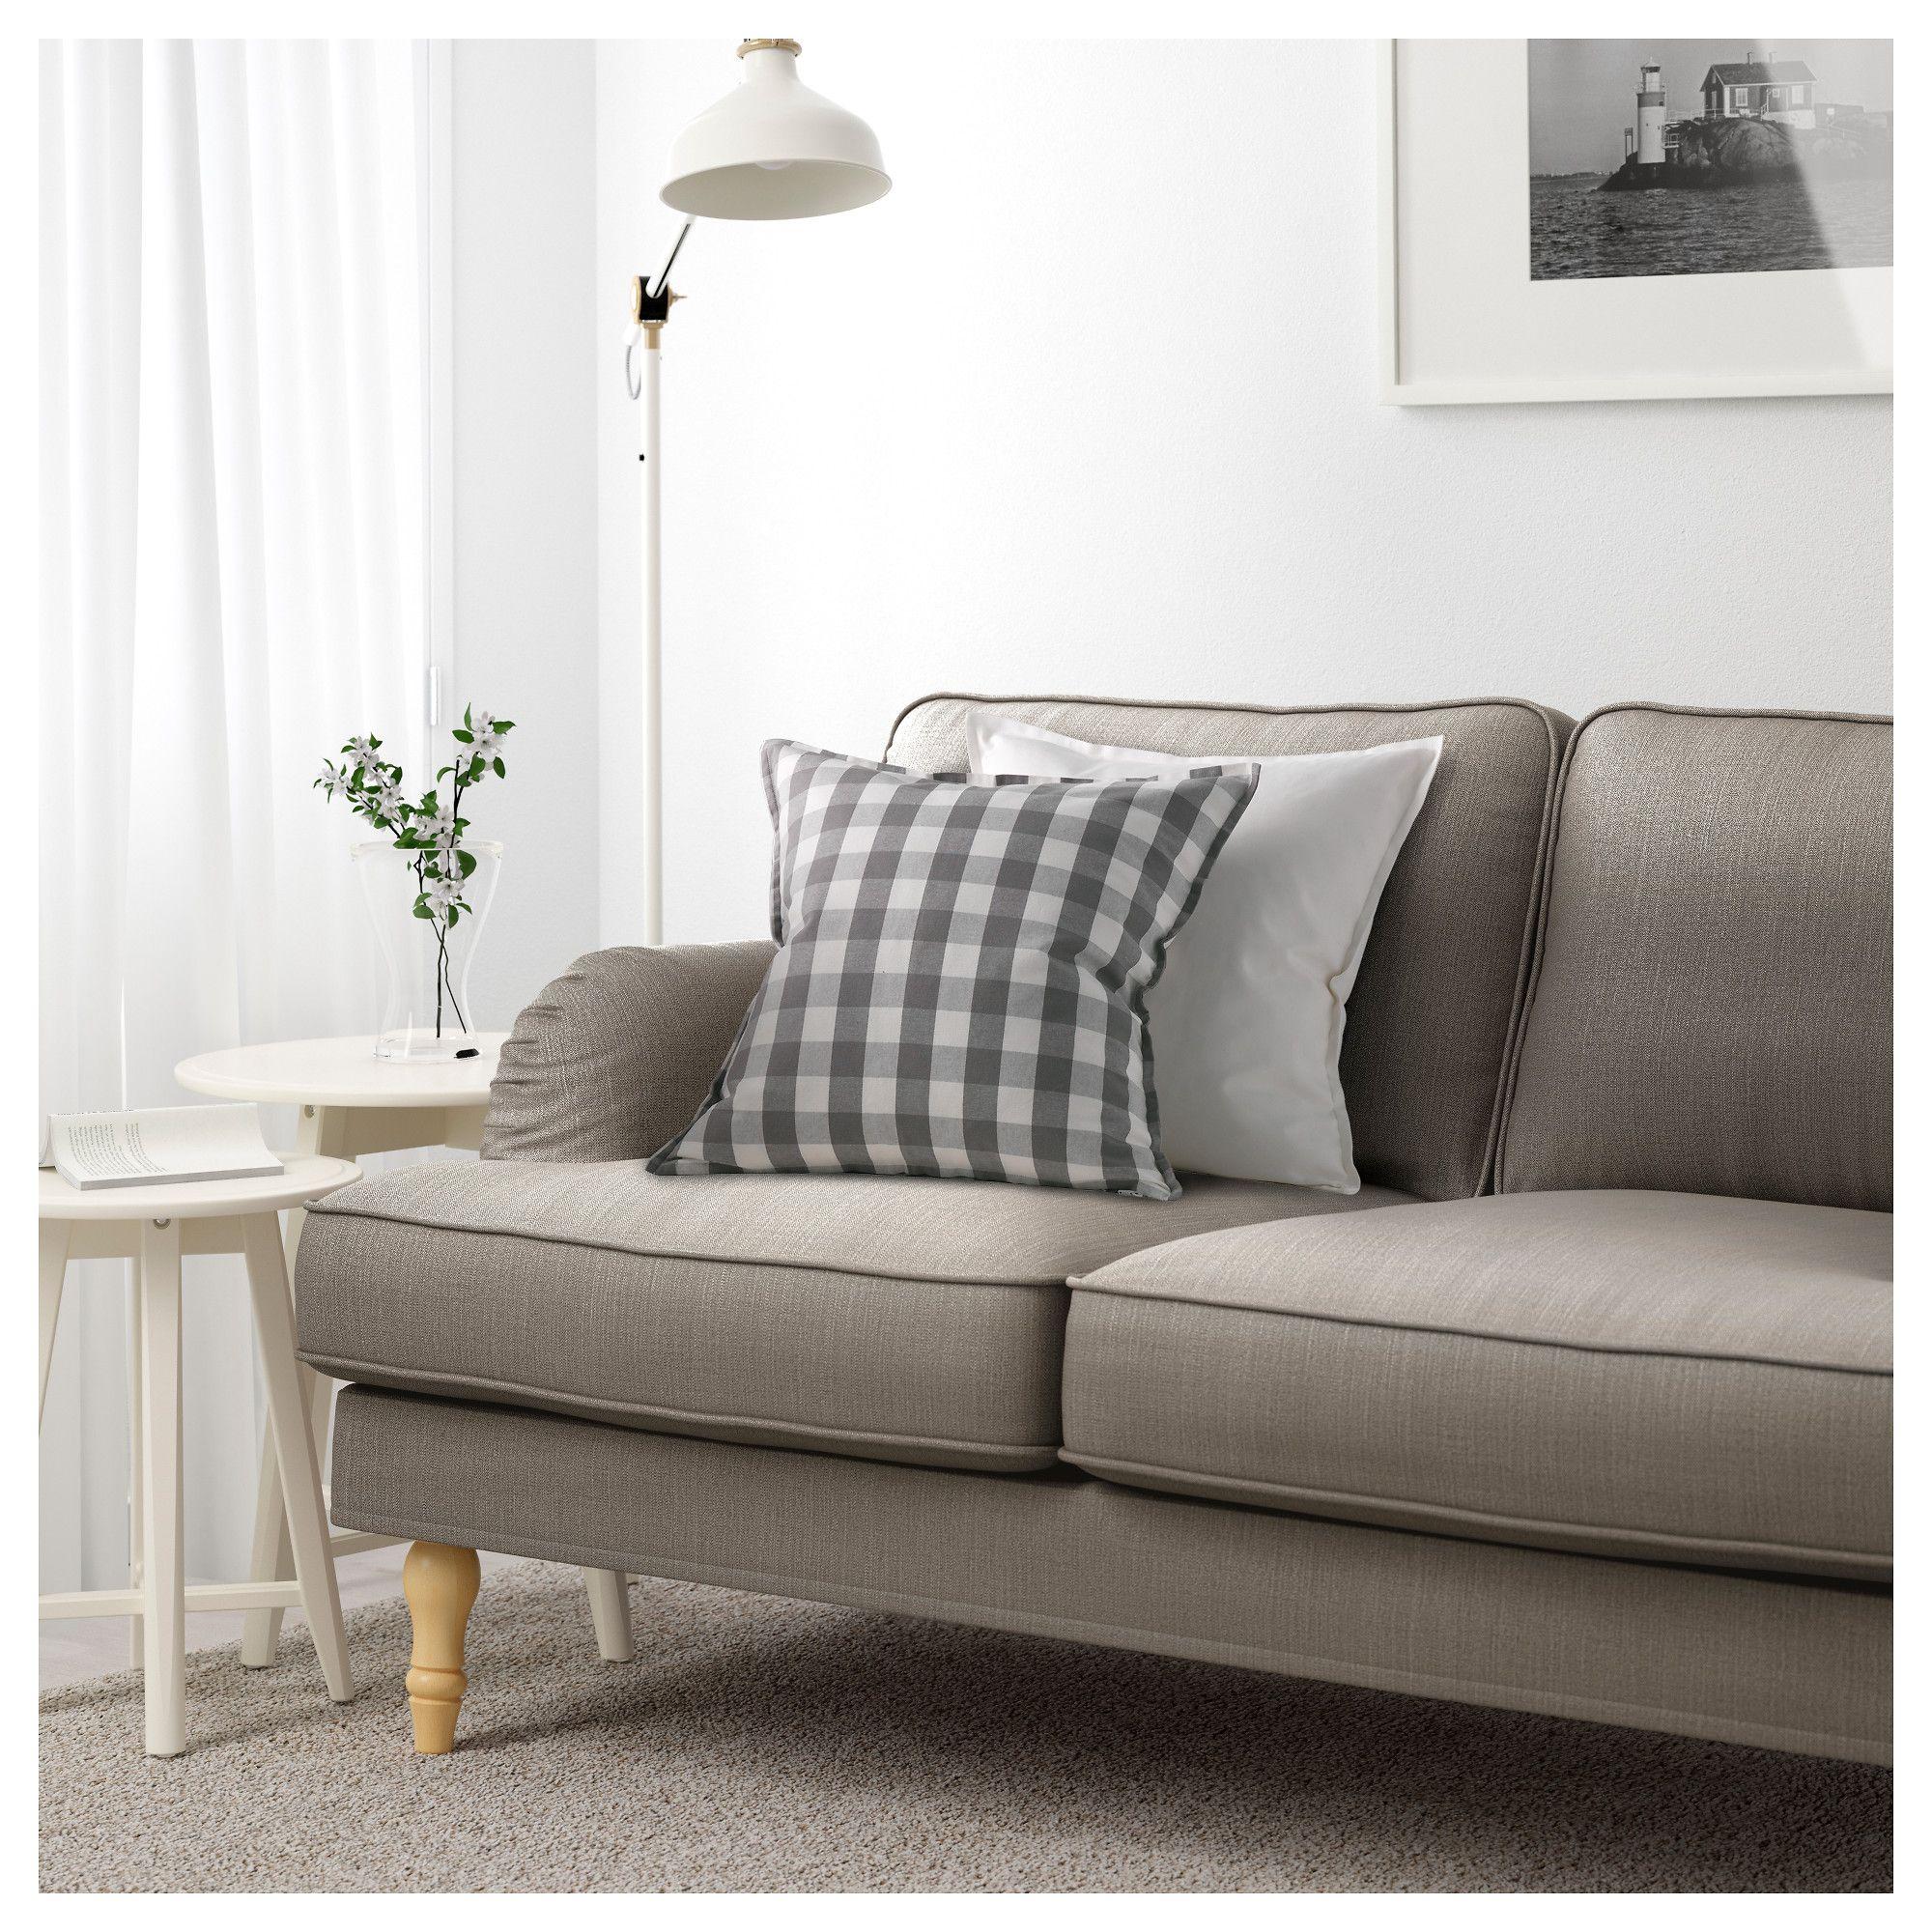 STOCKSUND 3-seat sofa - Nolhaga grey-beige, light brown ...